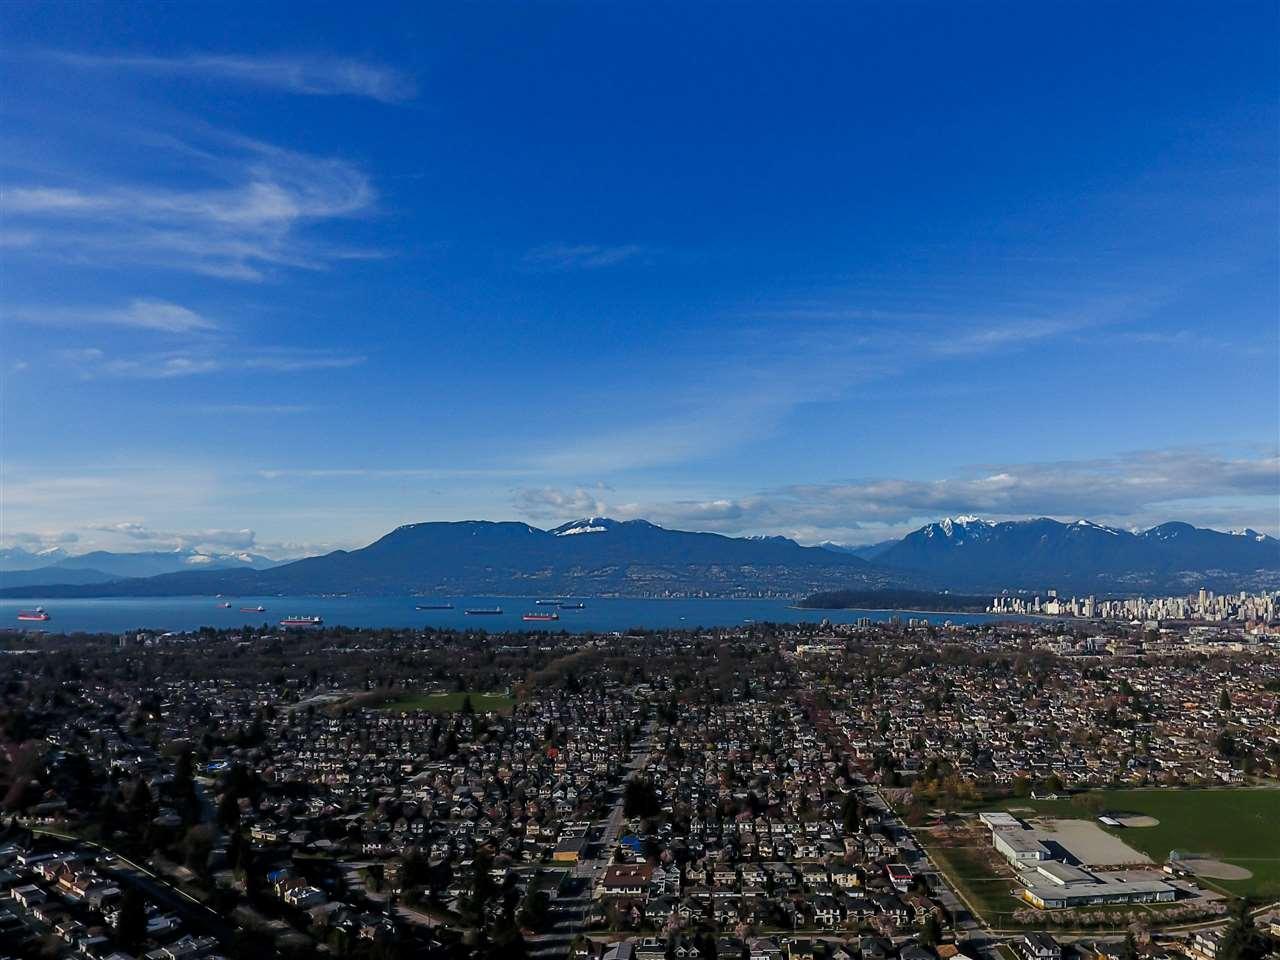 2763 W 30TH AVENUE, Vancouver, BC V6L 1Y8